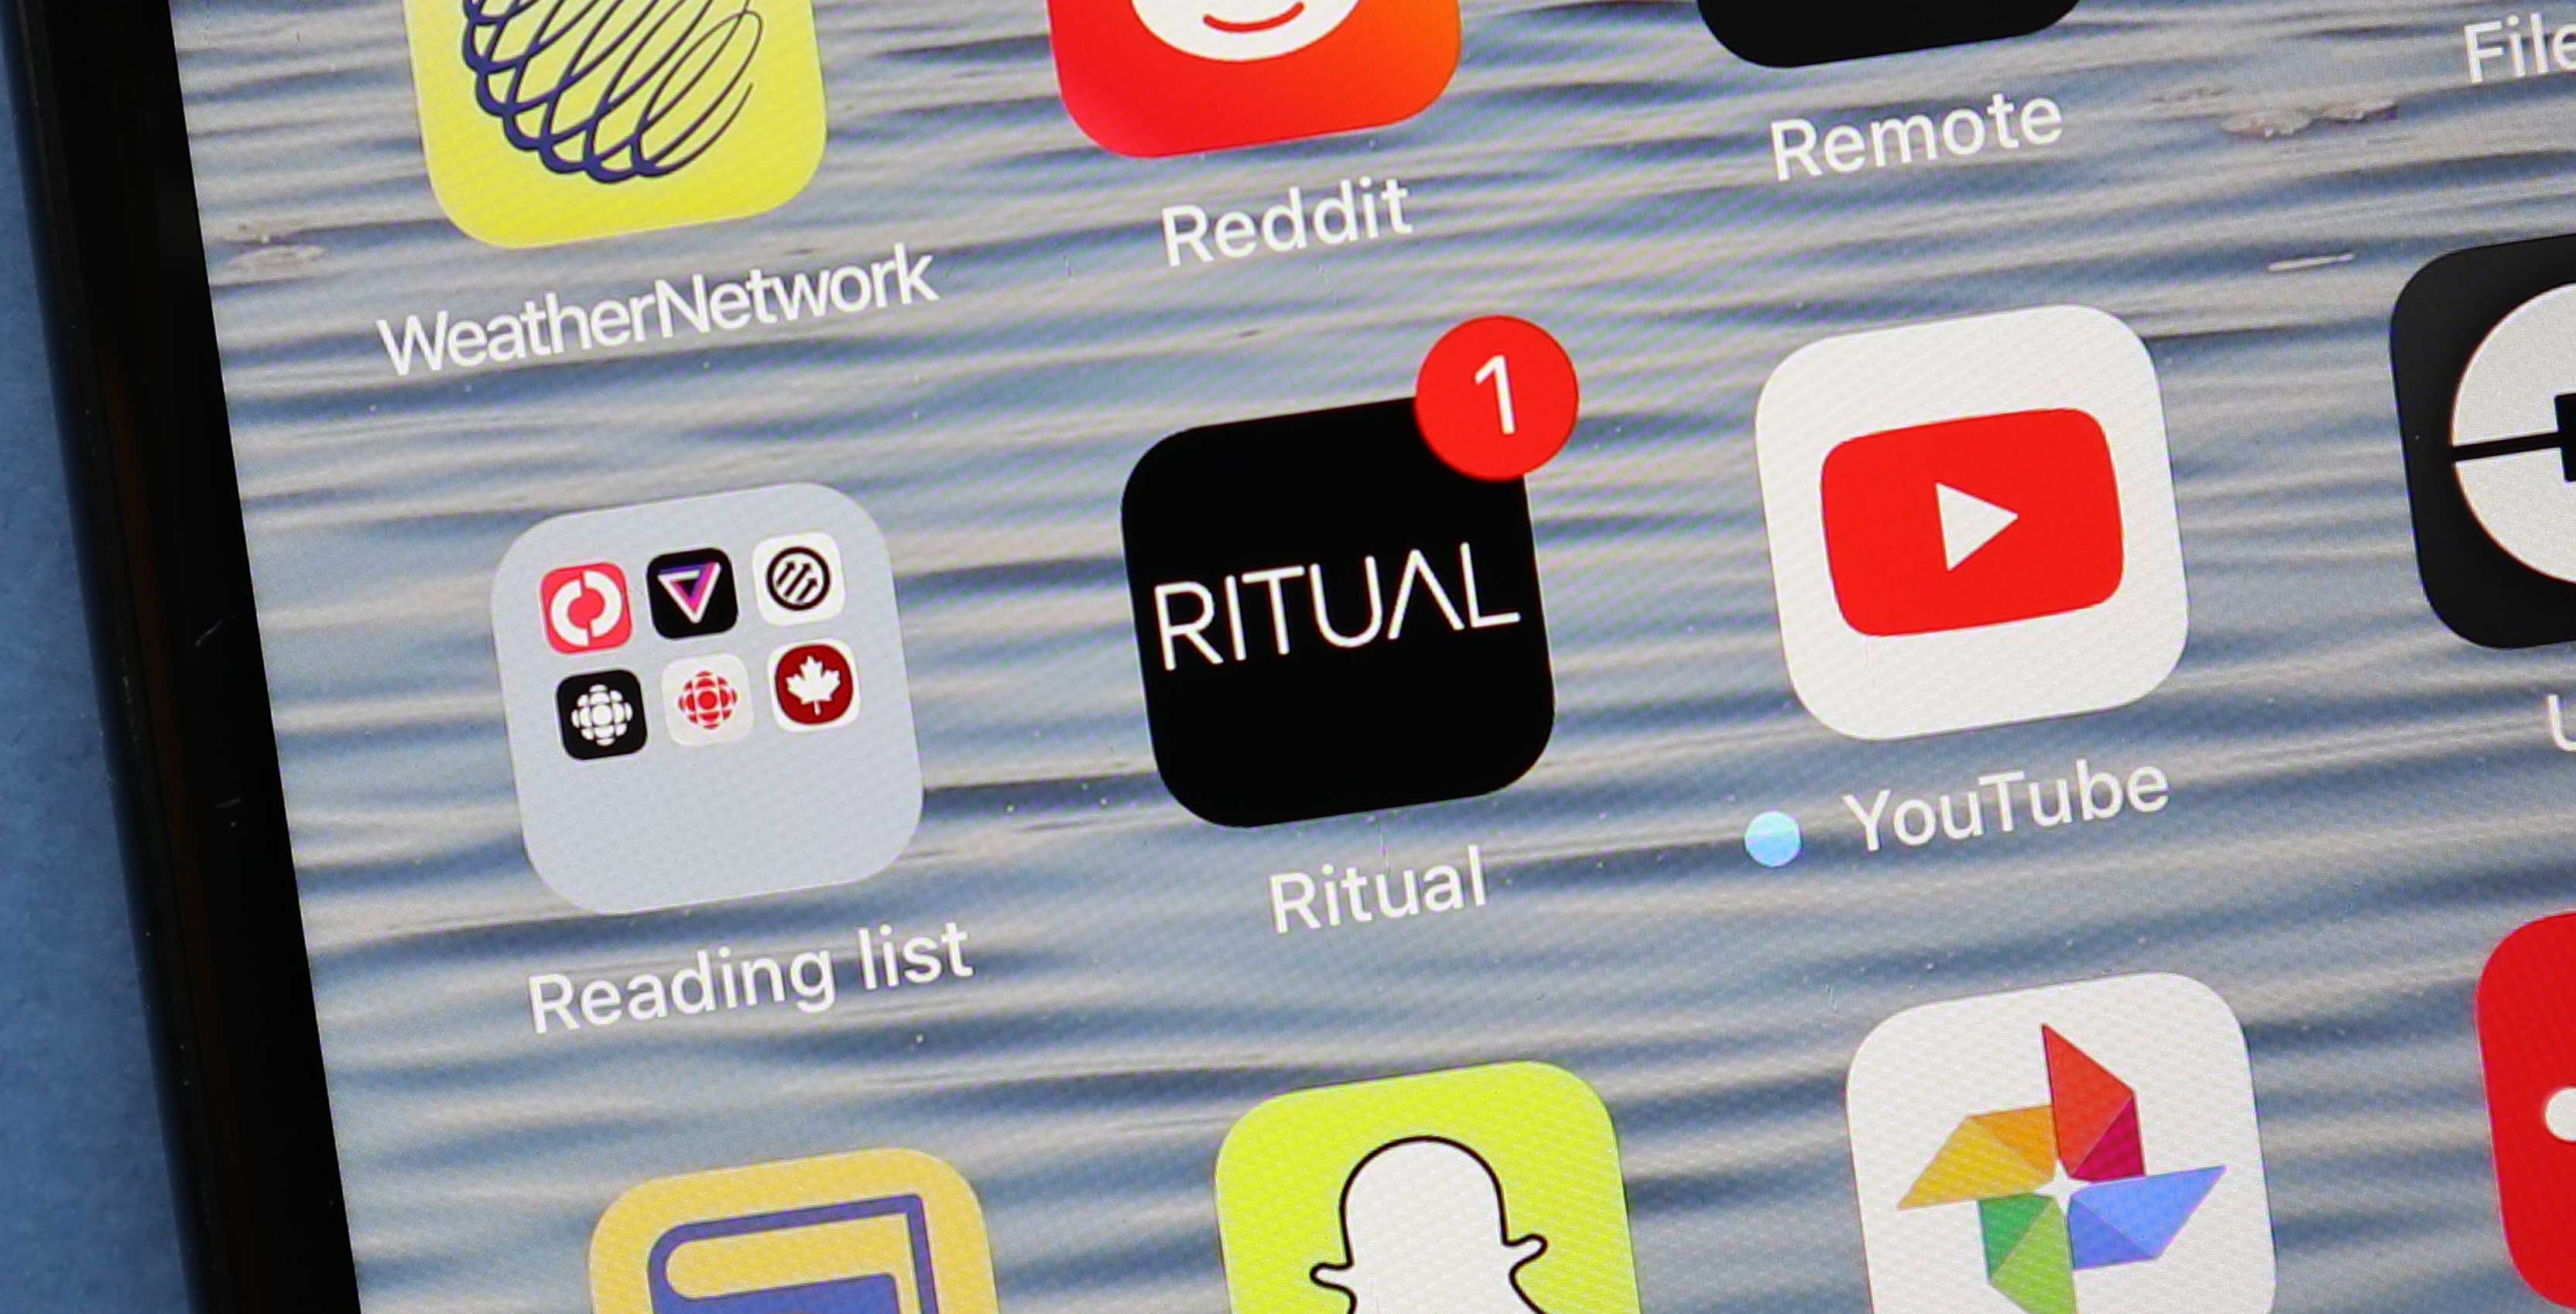 Ritual app